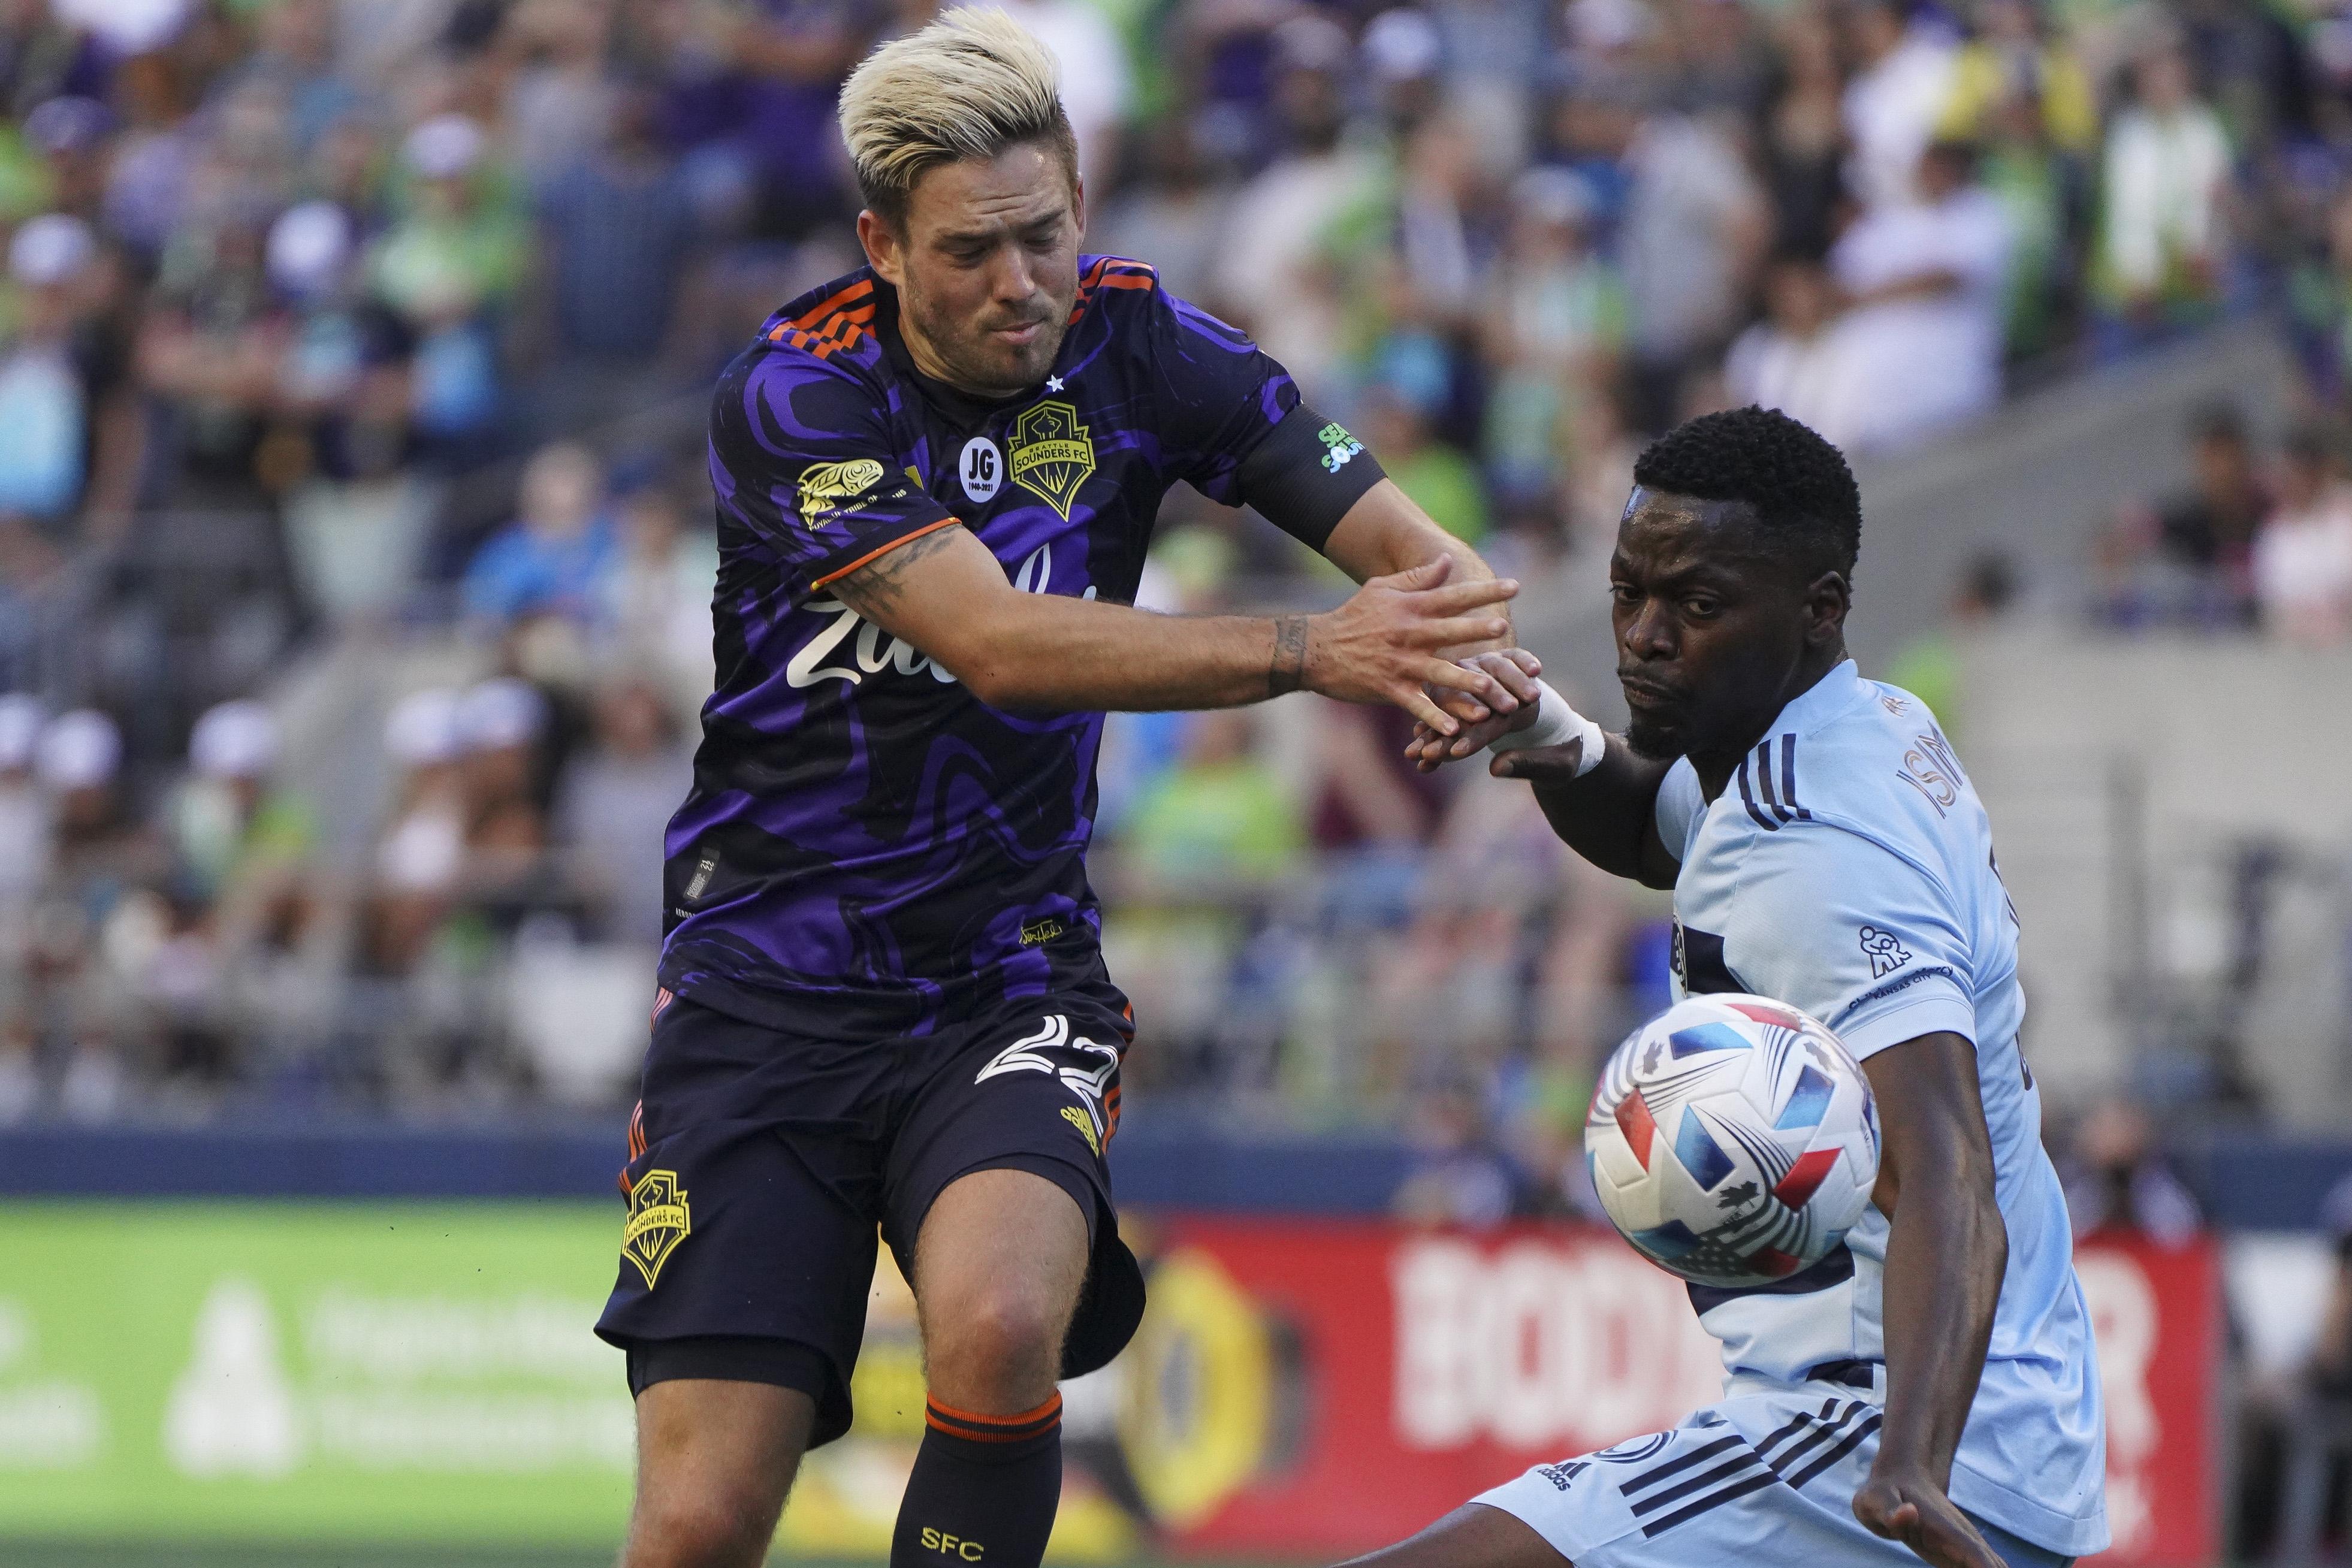 SOCCER: JUL 25 MLS - Sporting Kansas City at Seattle Sounders FC